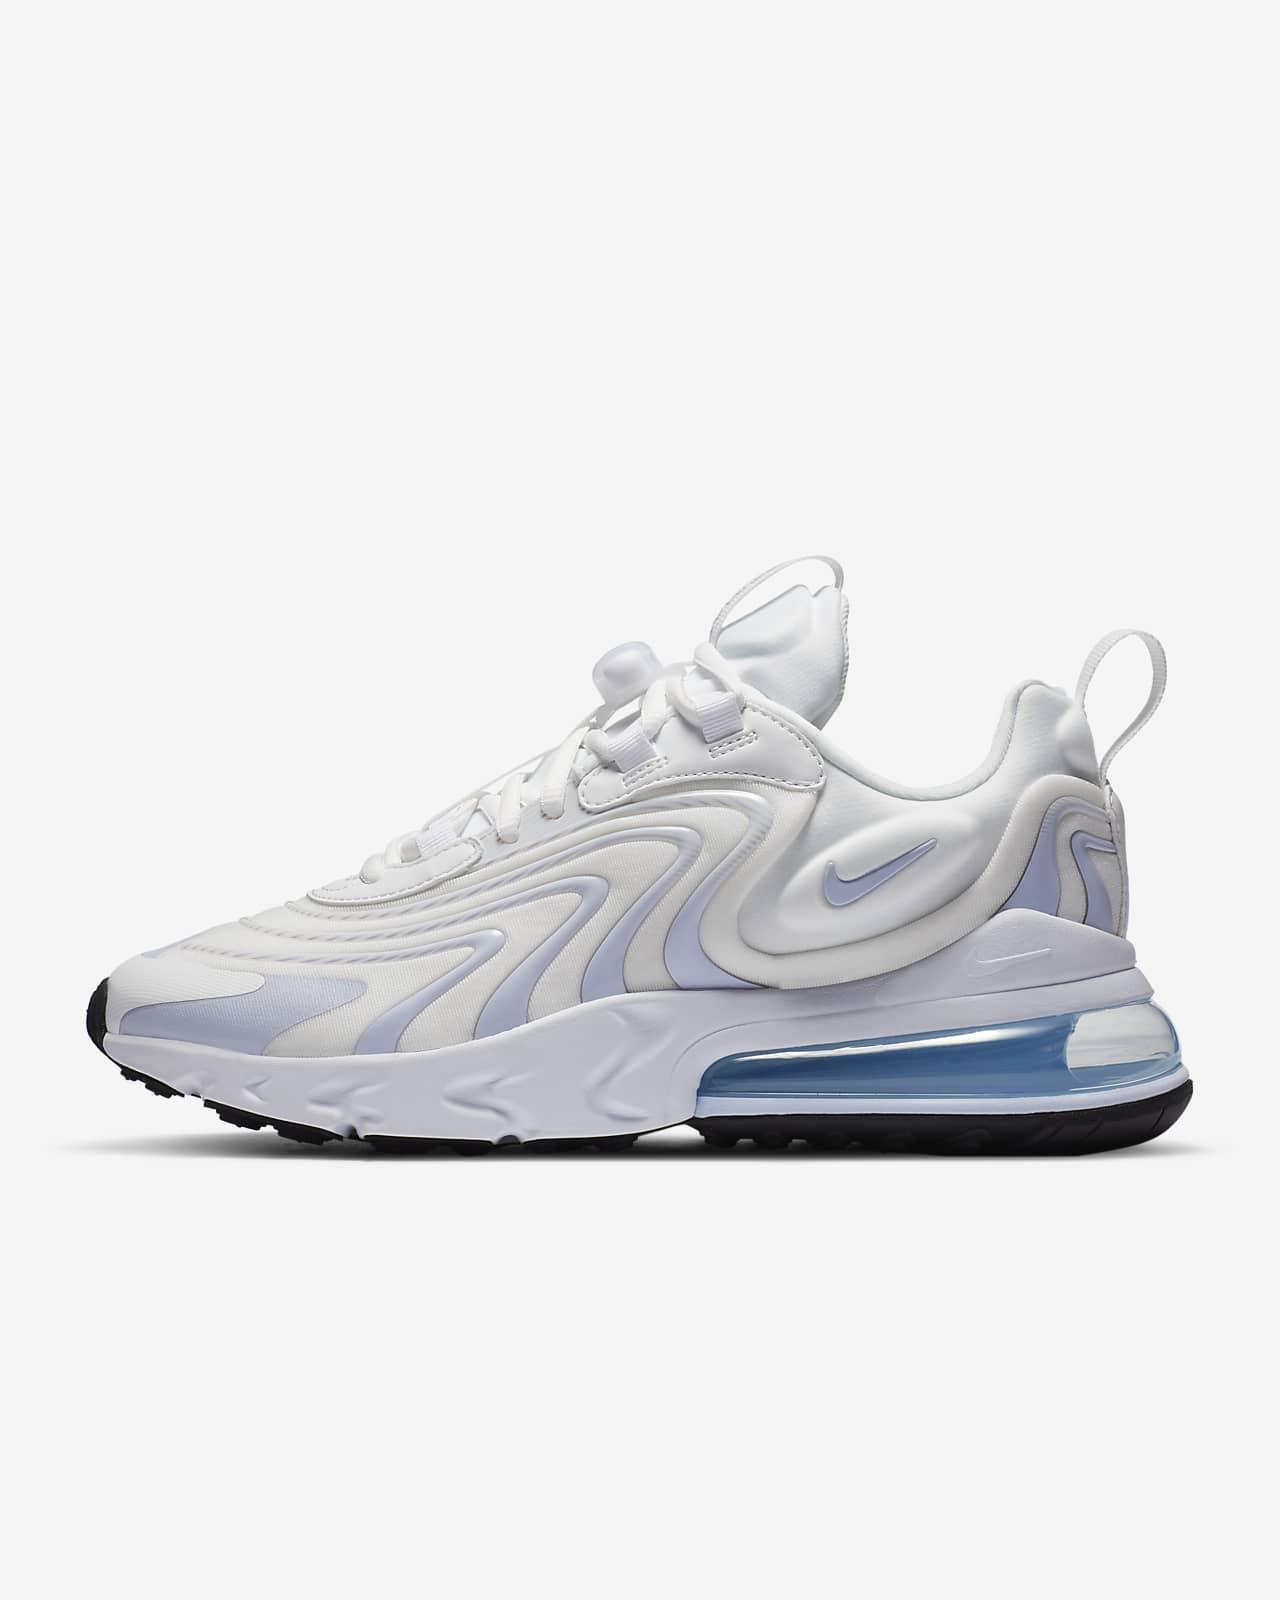 Nike Air Max 270 React ENG 女鞋